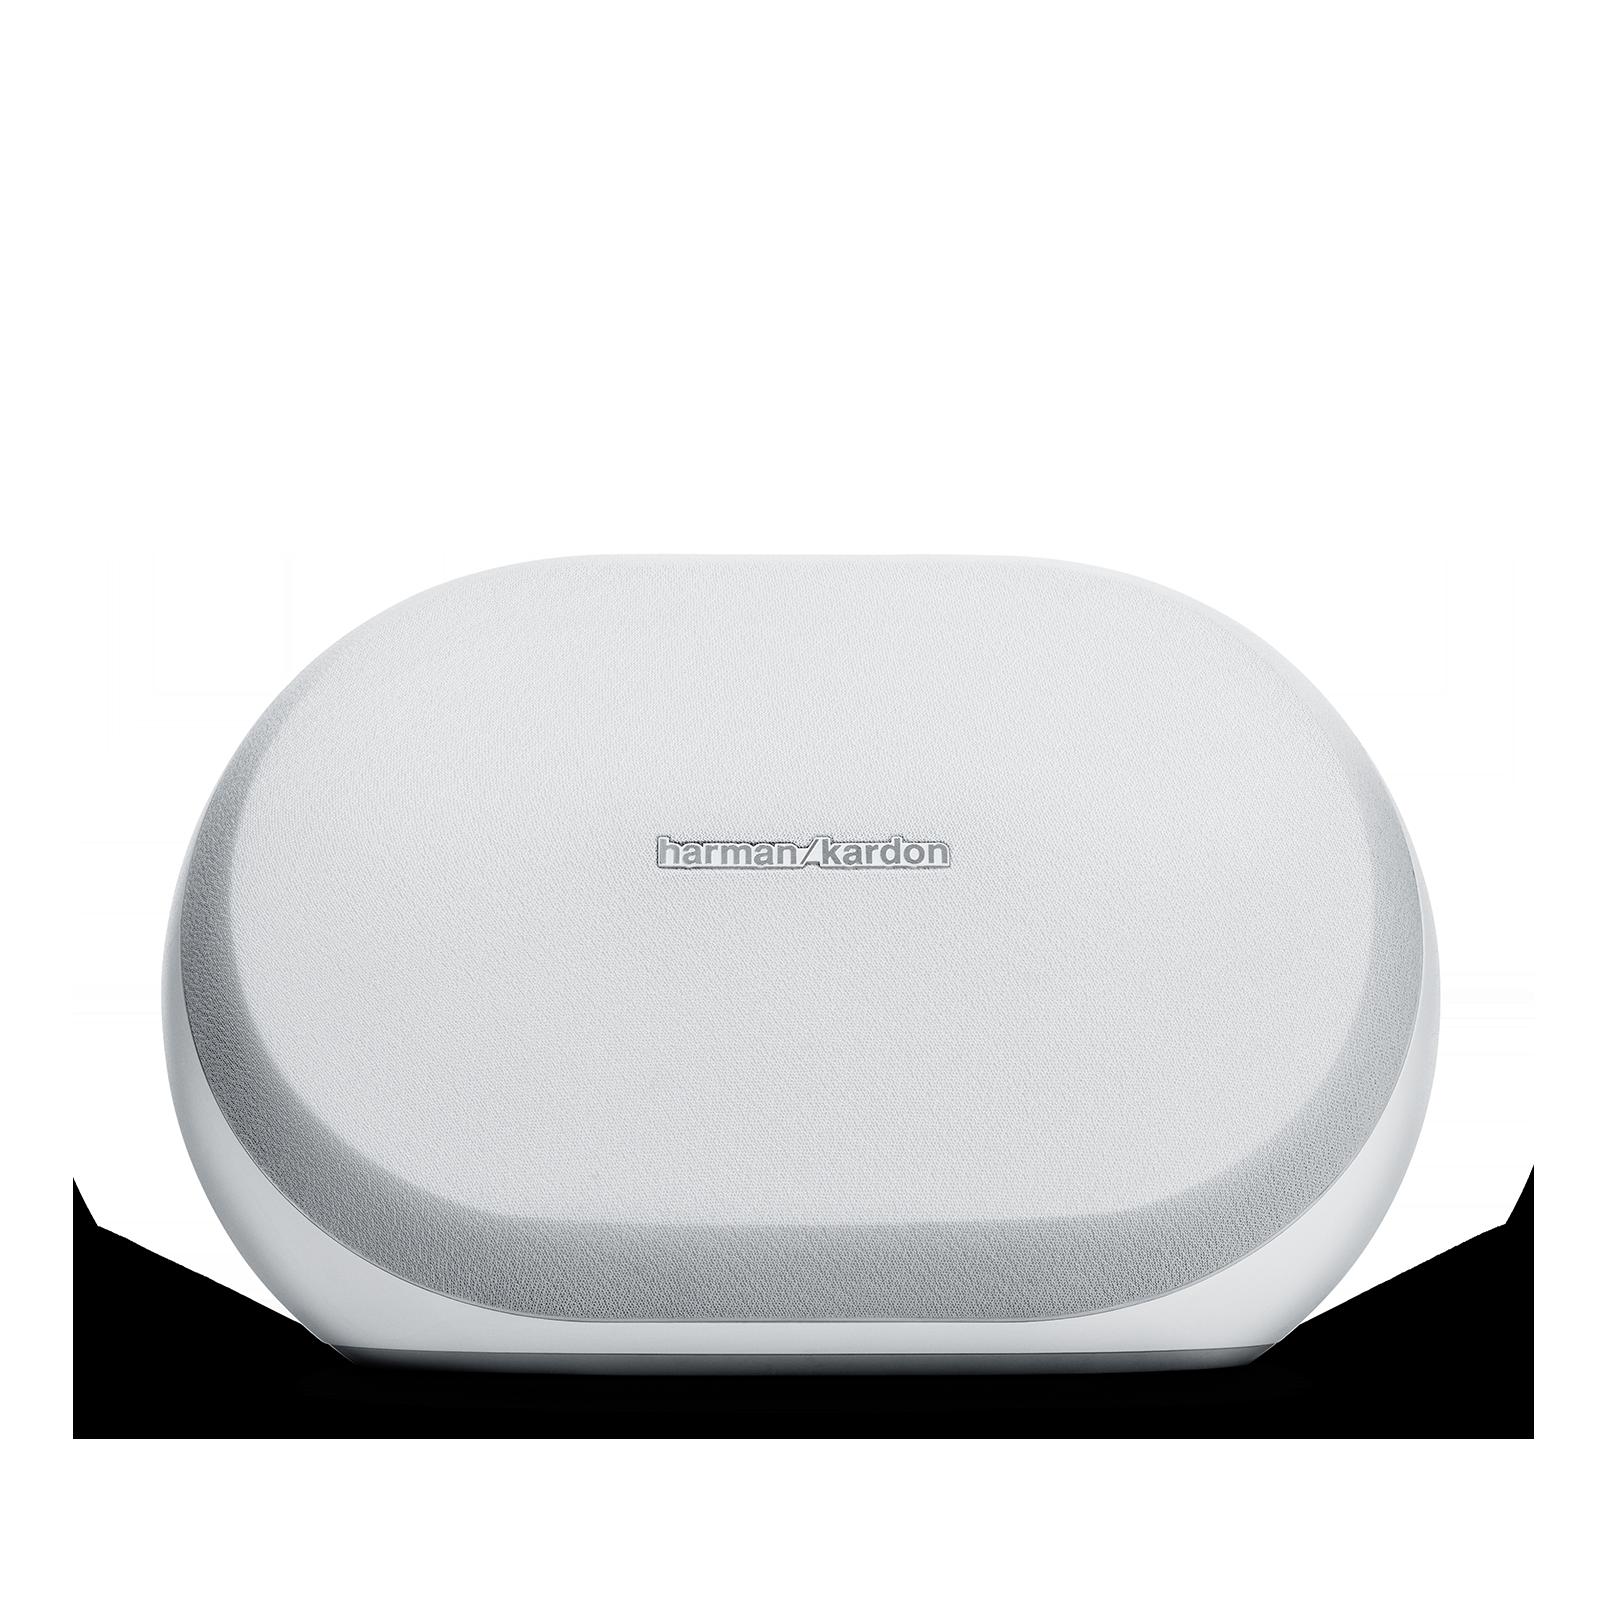 Omni 20 Plus - White - Wireless HD stereo speaker - Front